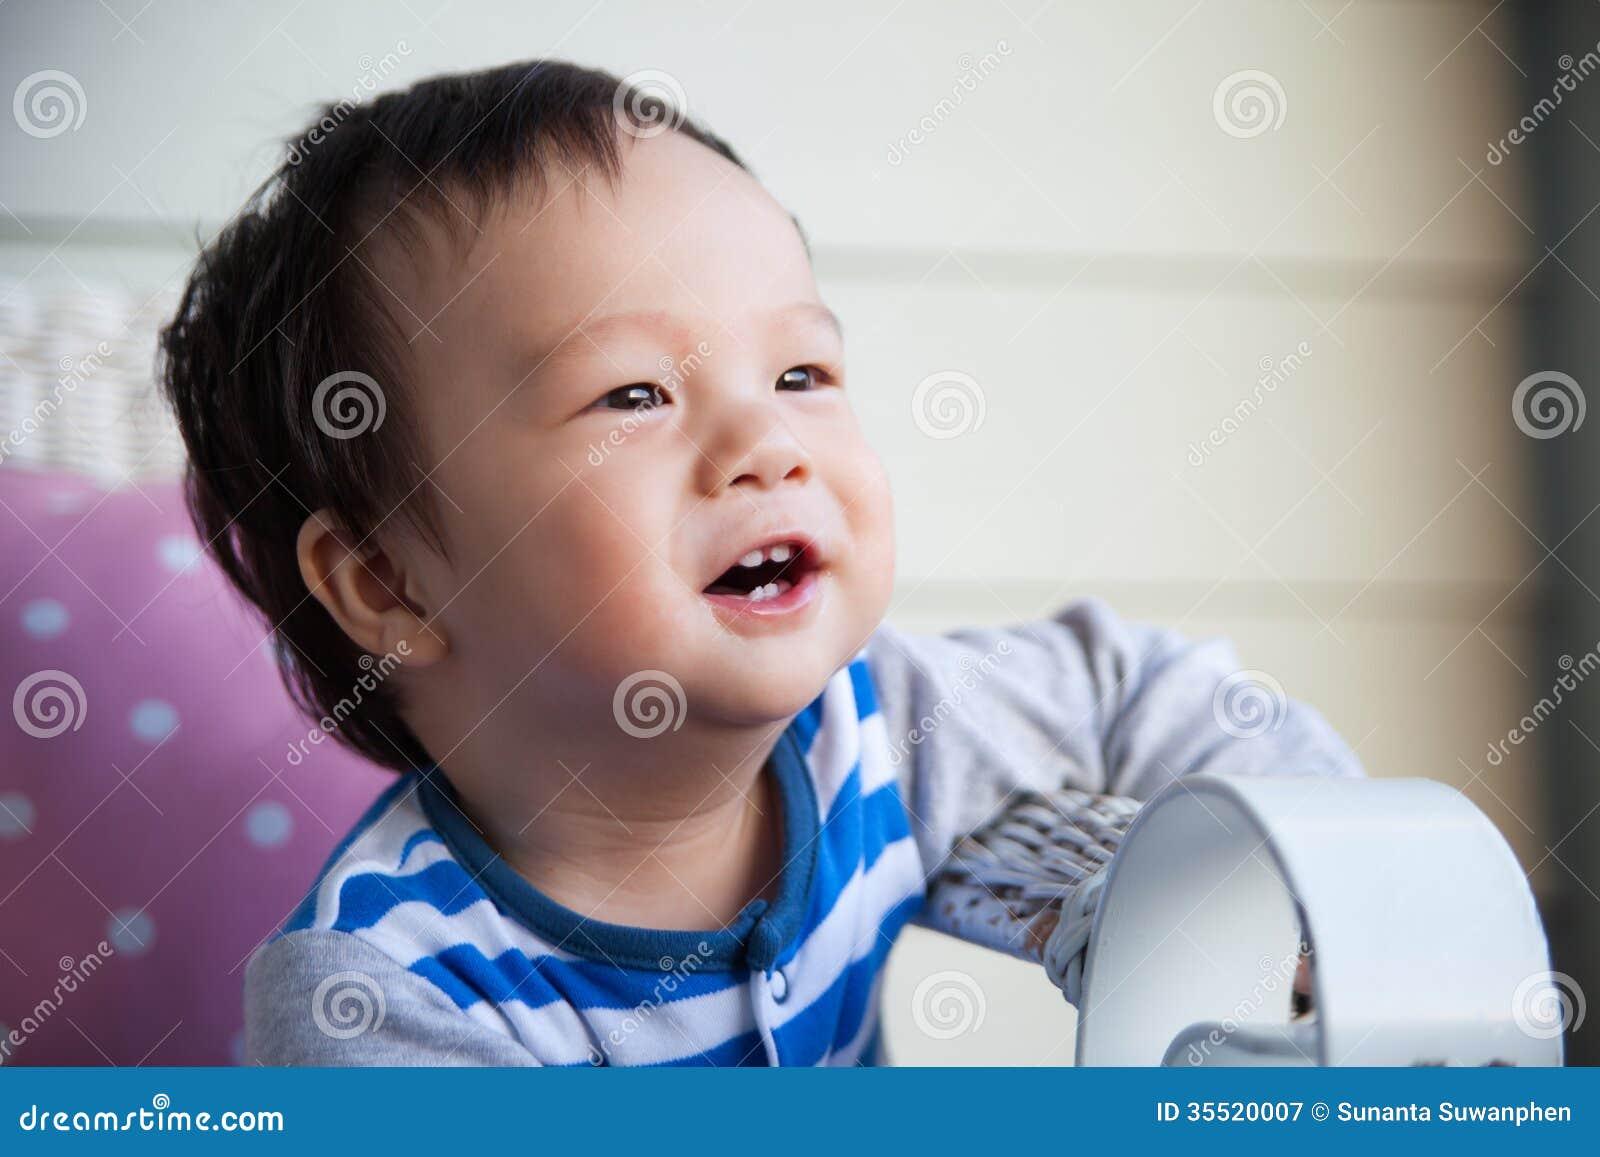 Cute Baby Boy On Sofa Stock Image. Image Of Black